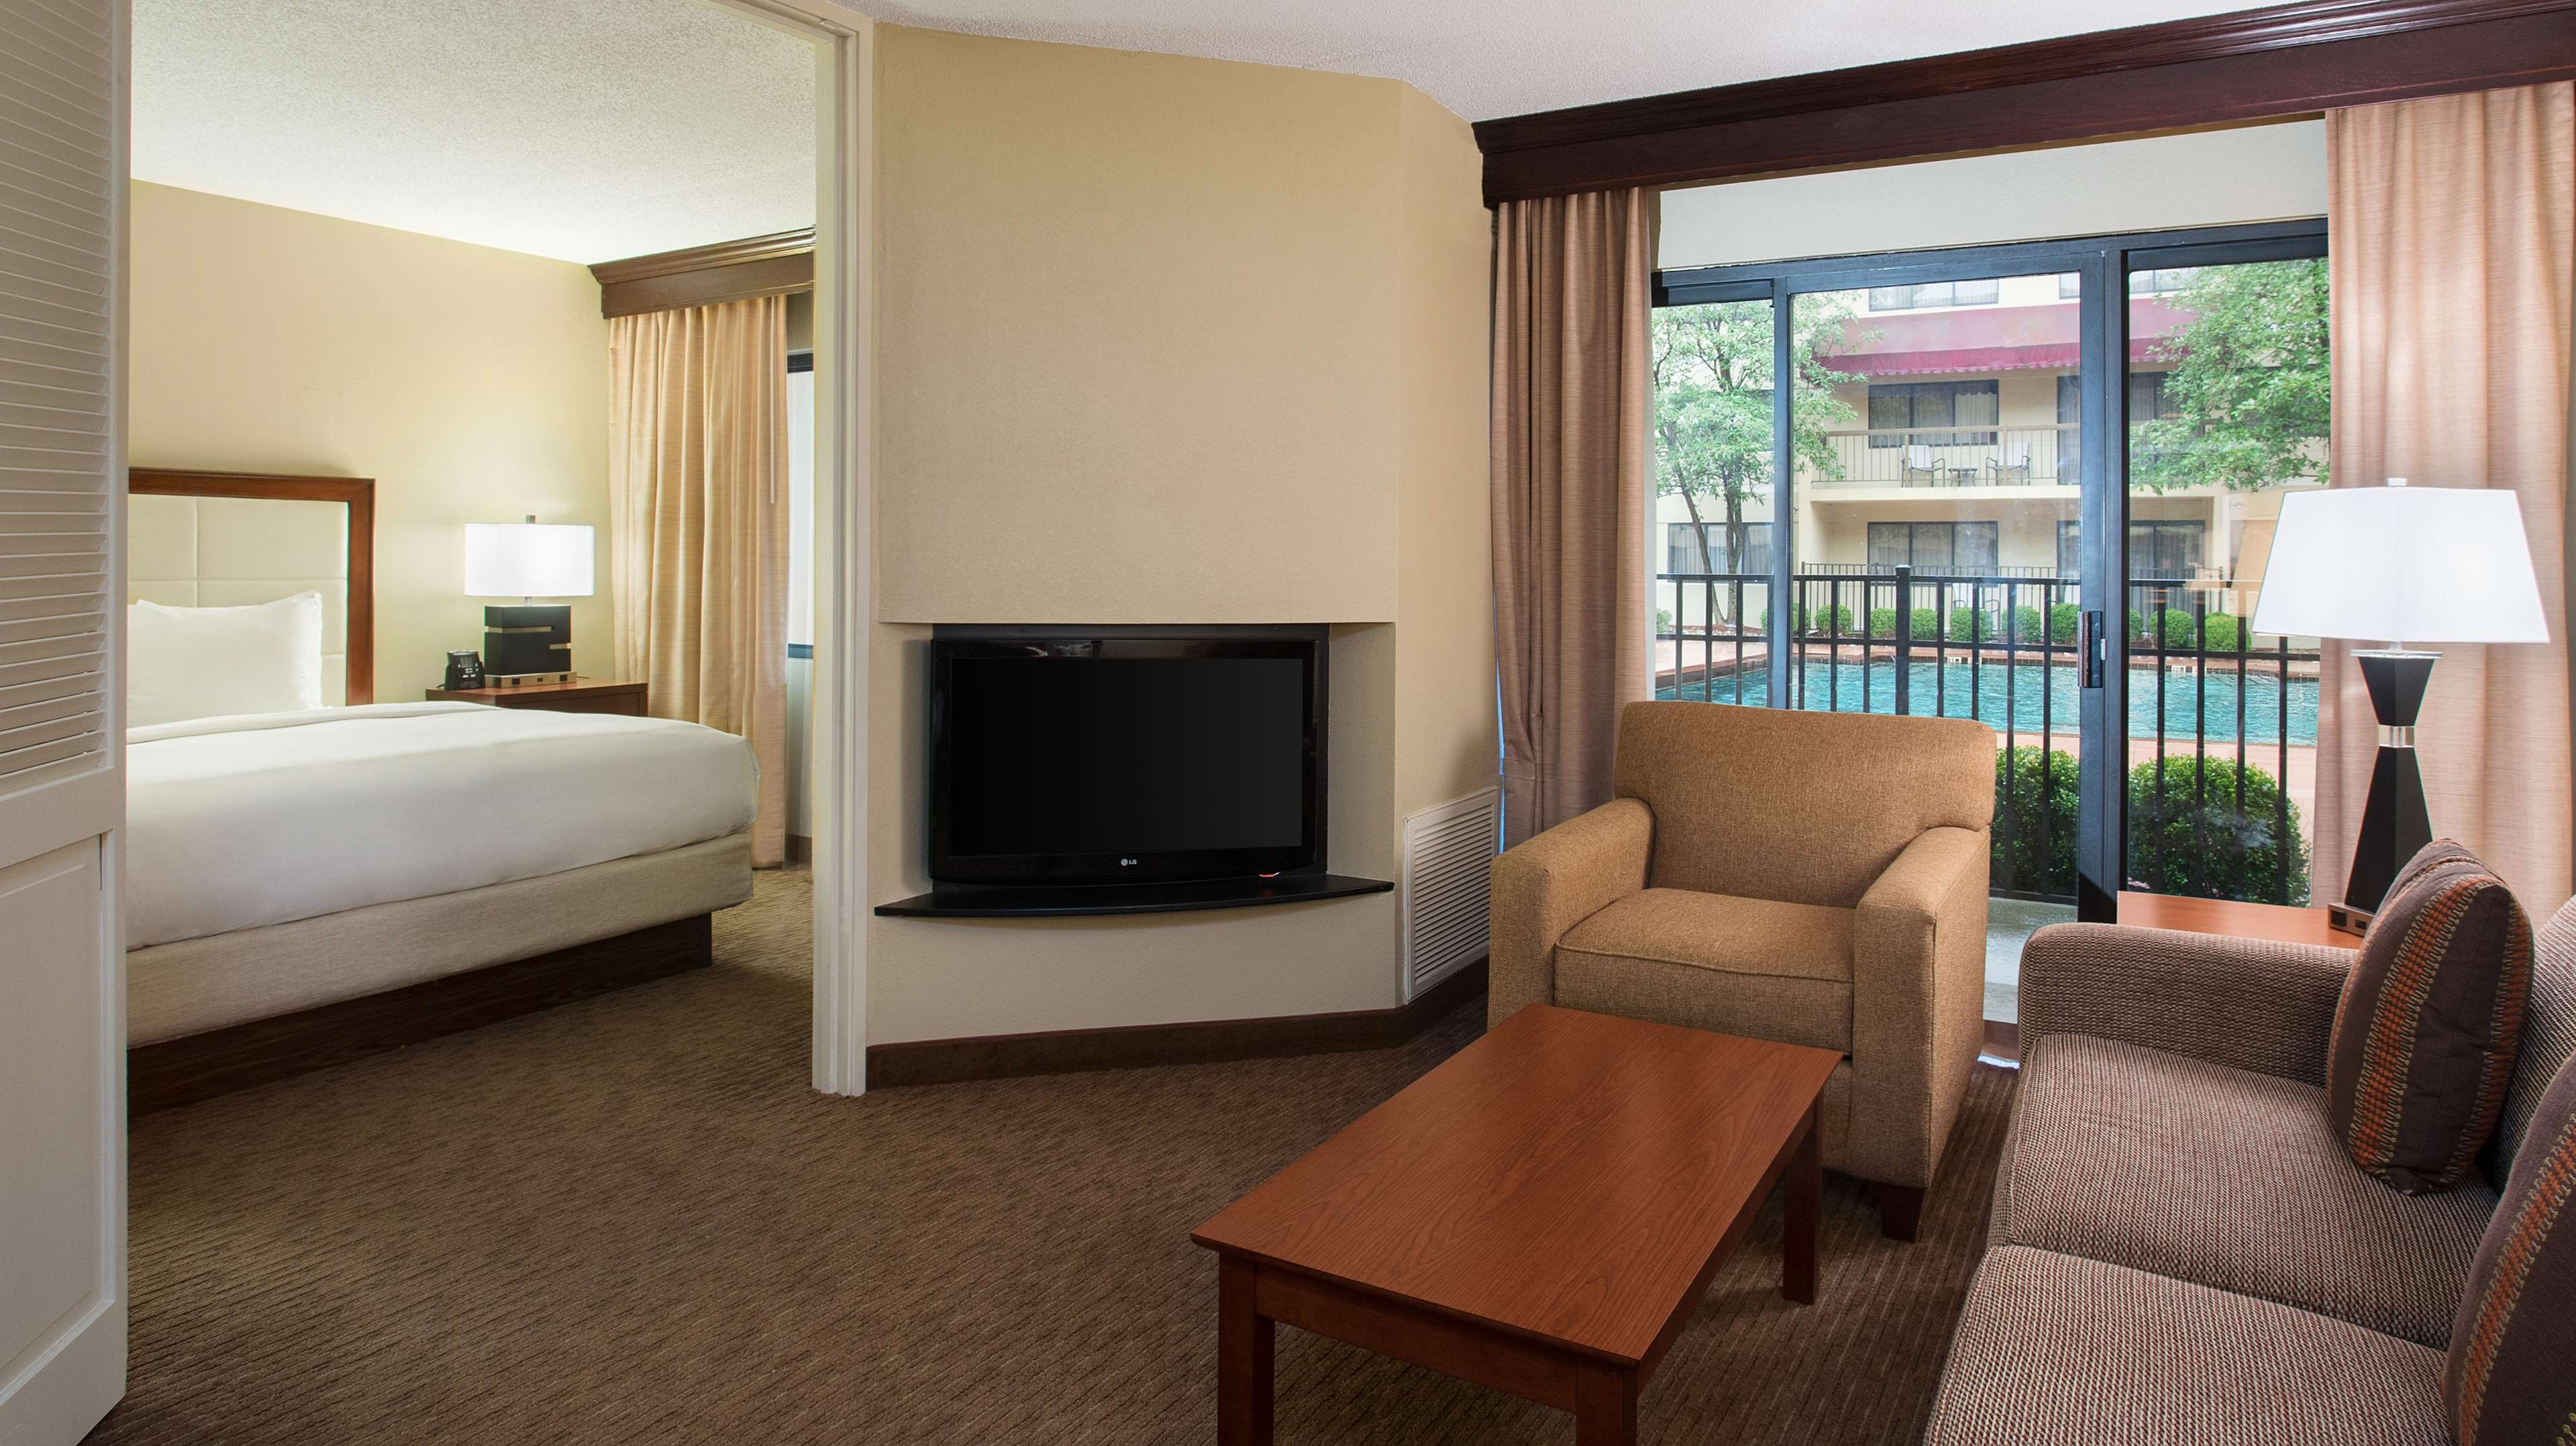 DoubleTree Suites by Hilton Hotel Cincinnati - Blue Ash image 36